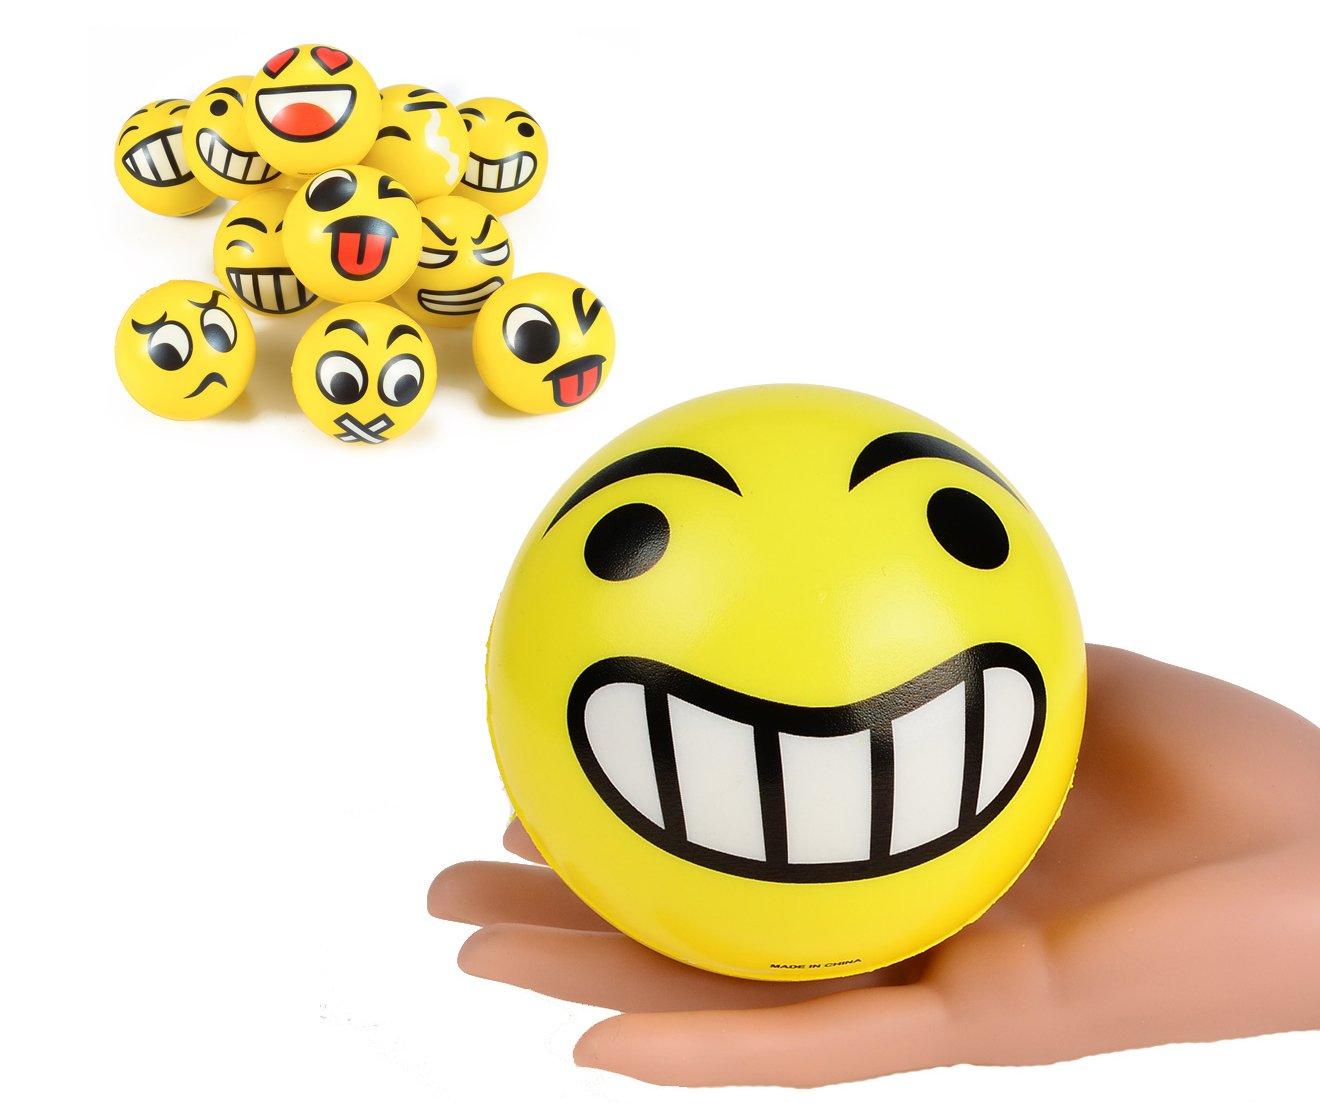 [4-Inch] Set of 12 JUMBO Emoji Face Yellow Foam Soft Stress Novelty Big Toy Balls (1 Dozen) (4'')